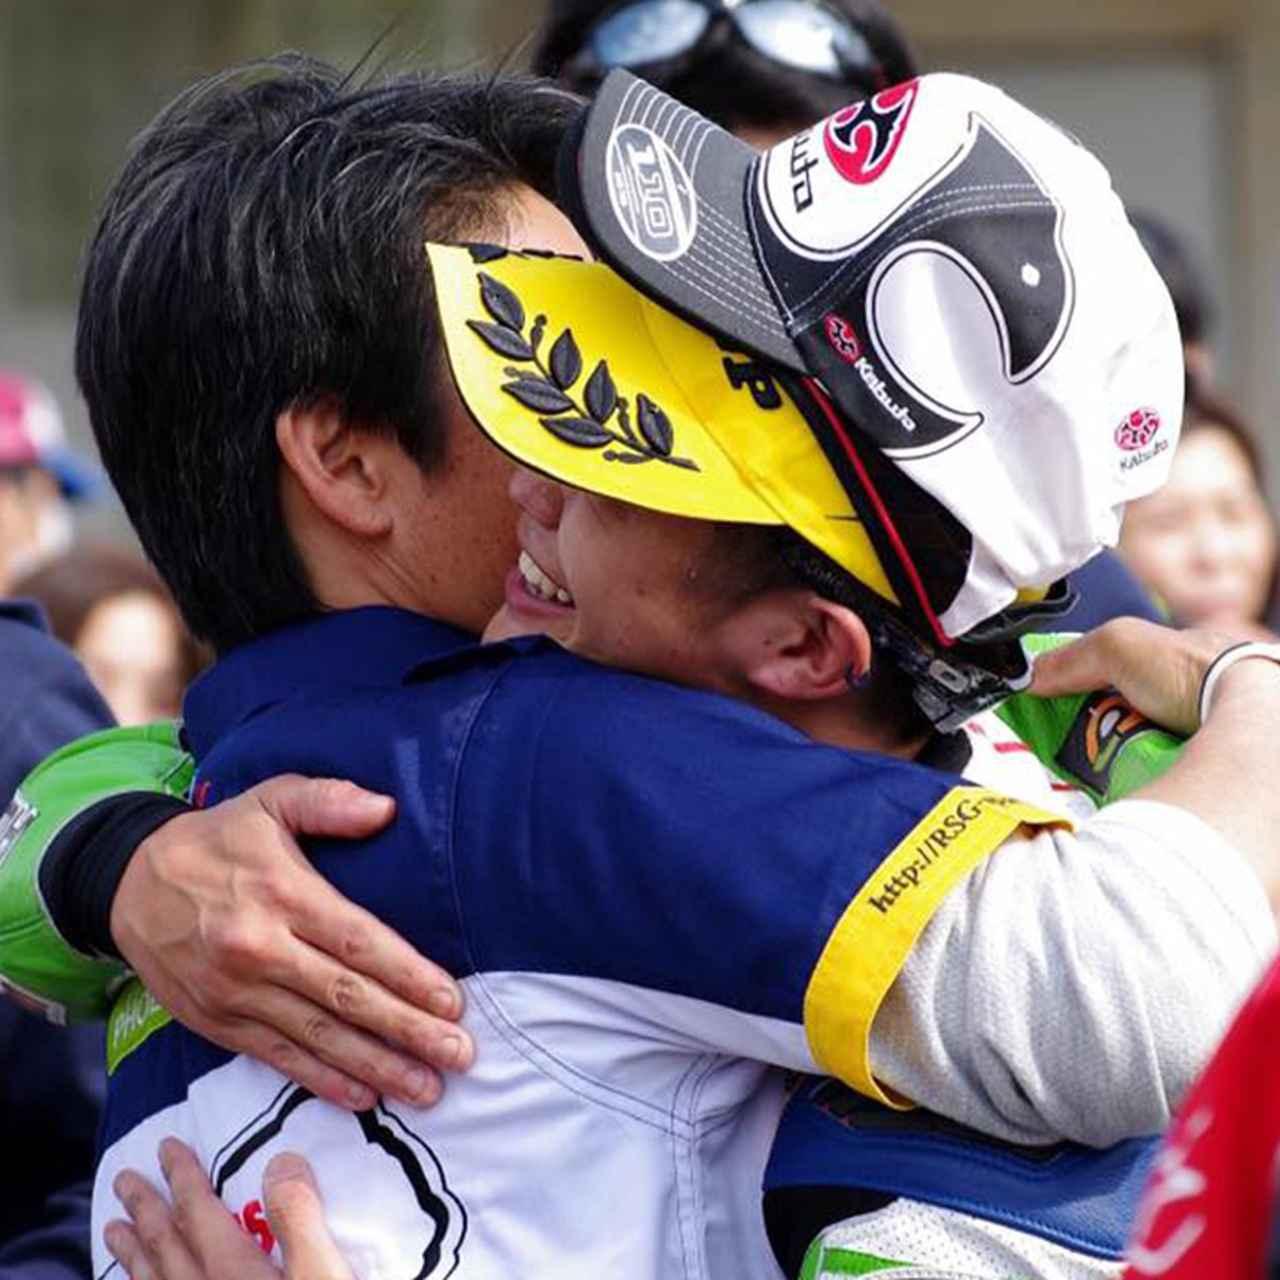 画像: Okamura Mitsunori OFFICIAL WEB SITE